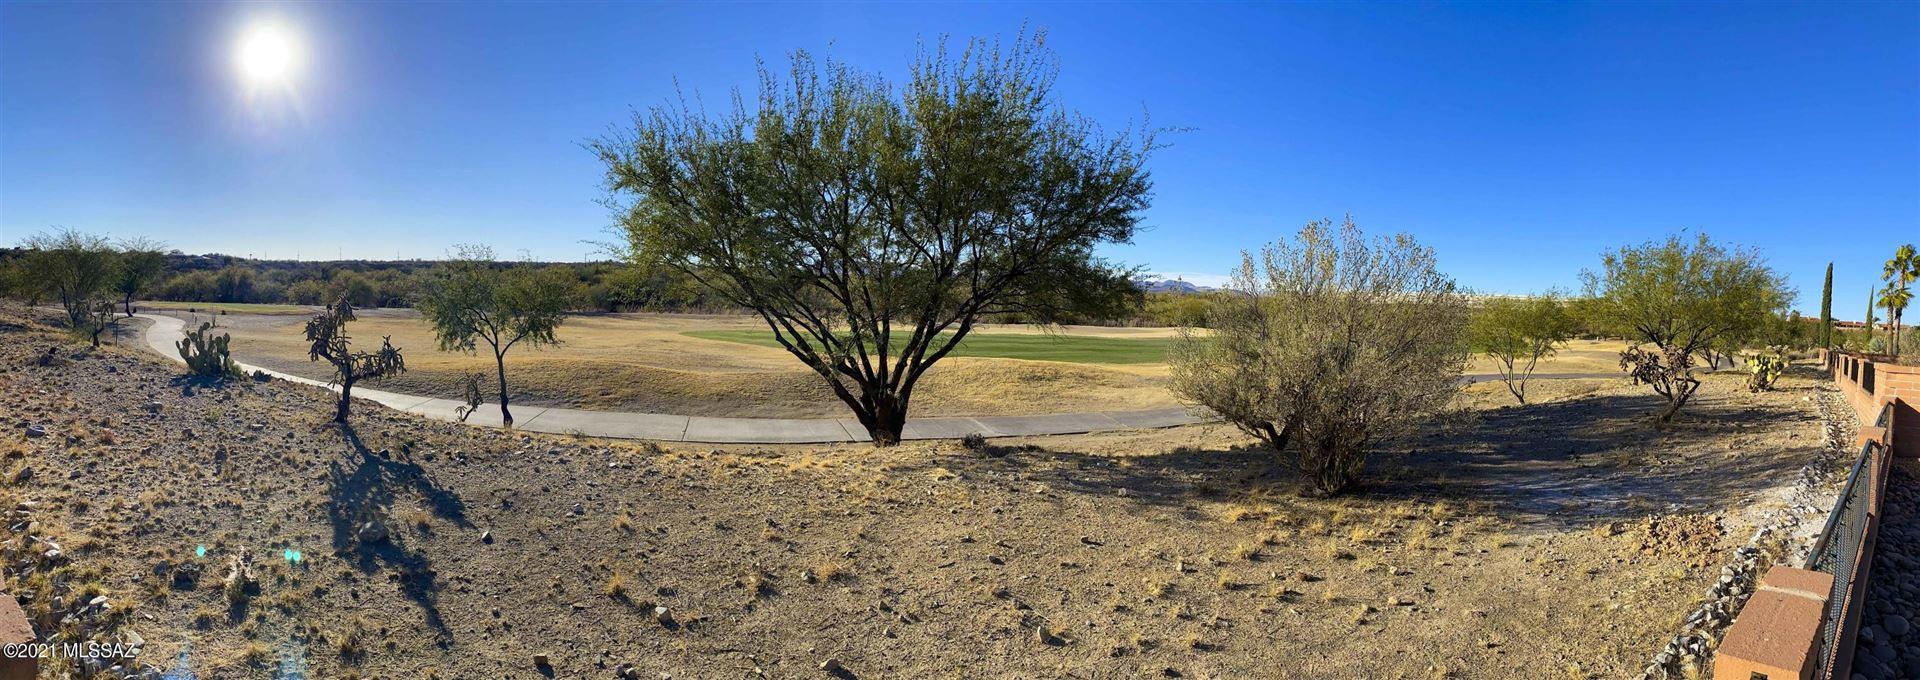 4254 S Camino Del Tejon, Green Valley, AZ 85622 - MLS#: 22100187